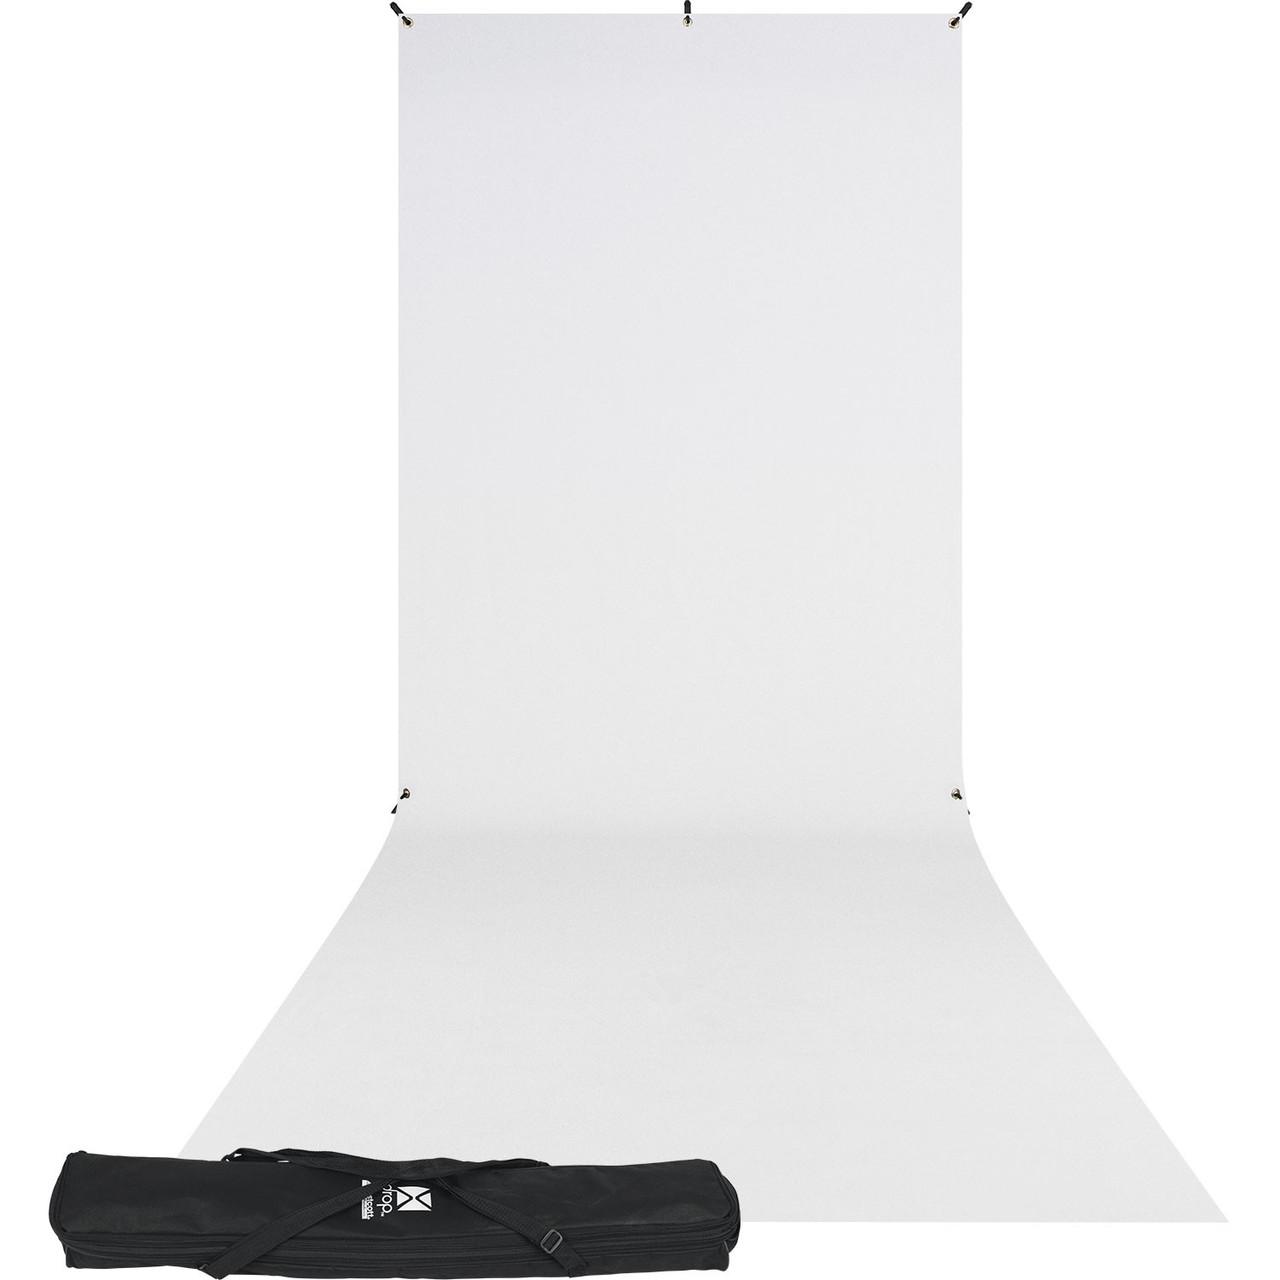 Westcott X-Drop Wrinkle-Resistant Backdrop Sweep Kit - 5' x 12' (White)